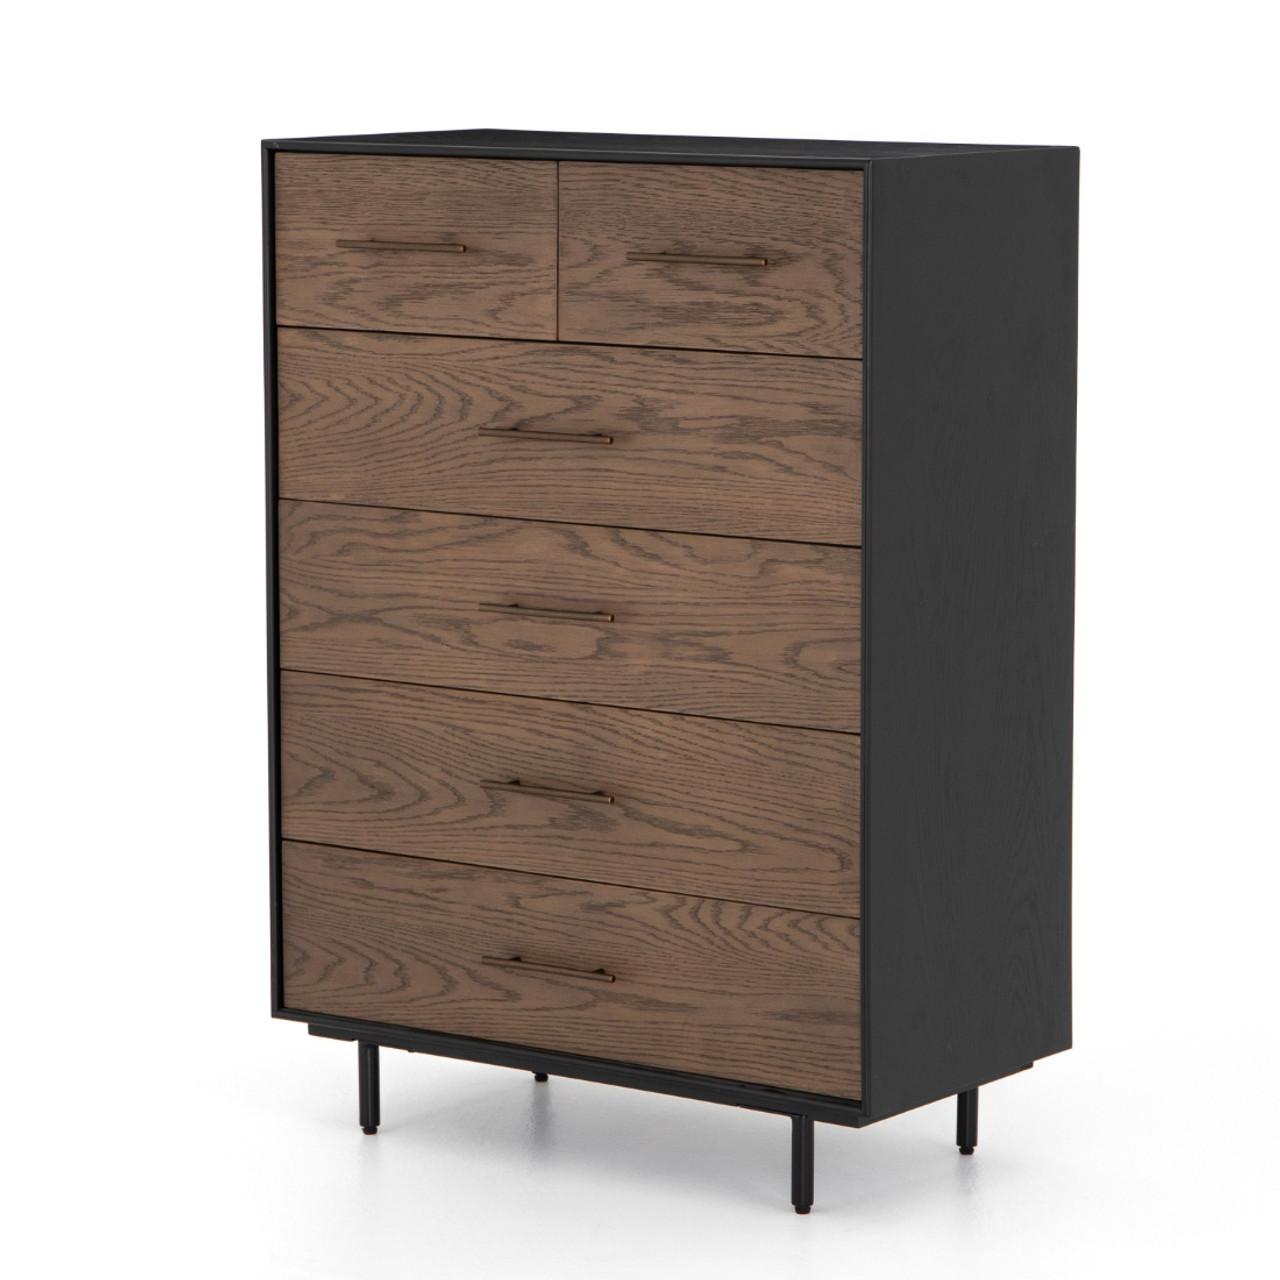 Modern Chest of Drawers, Dresser of Drawers Oak Chest of Drawers Black Chest of Drawers